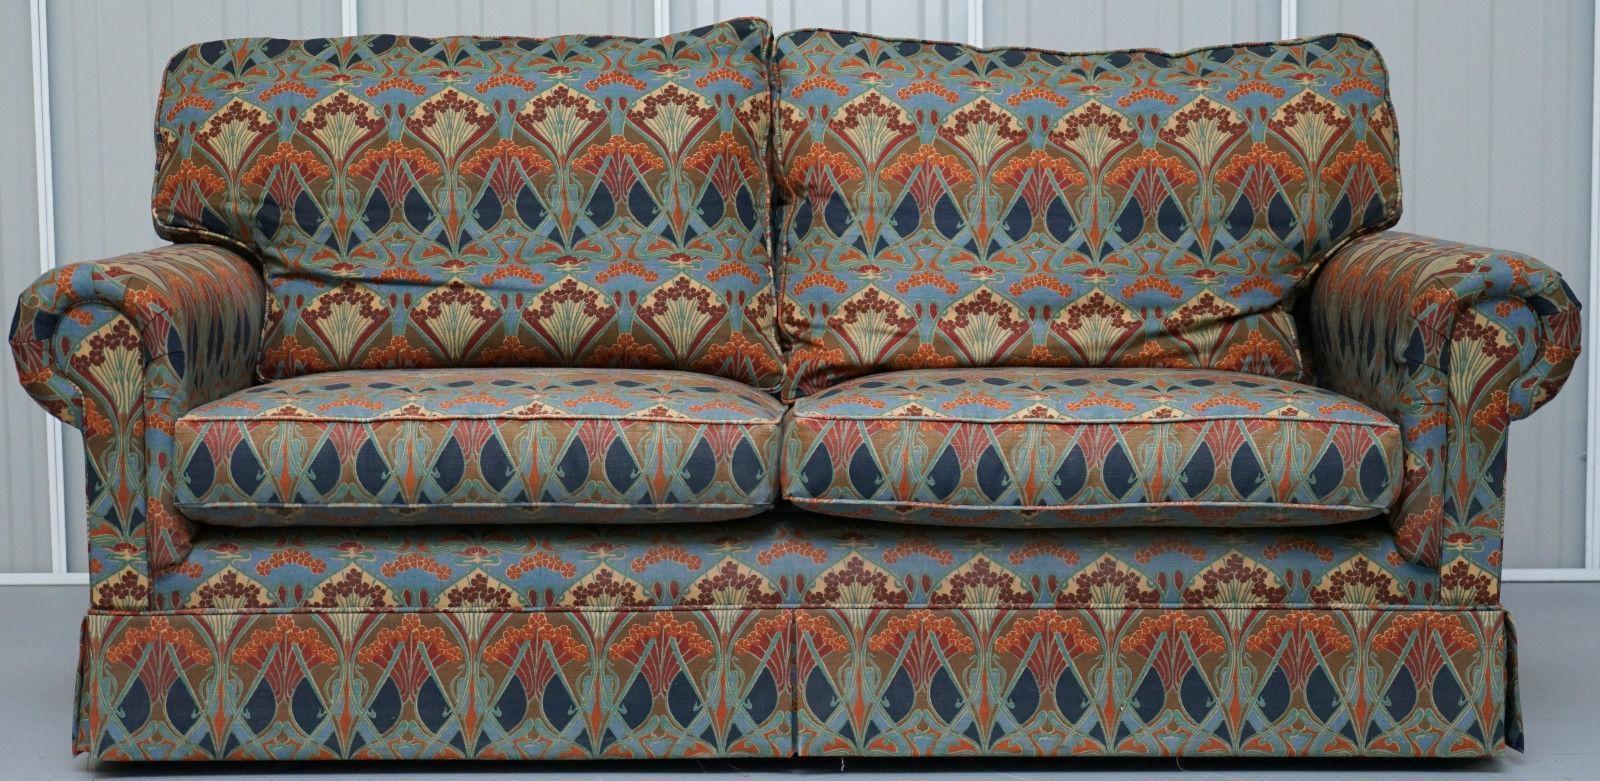 Classic English Fabric Sofas | Sofa Ideas For Classic English Sofas (Image 6 of 21)